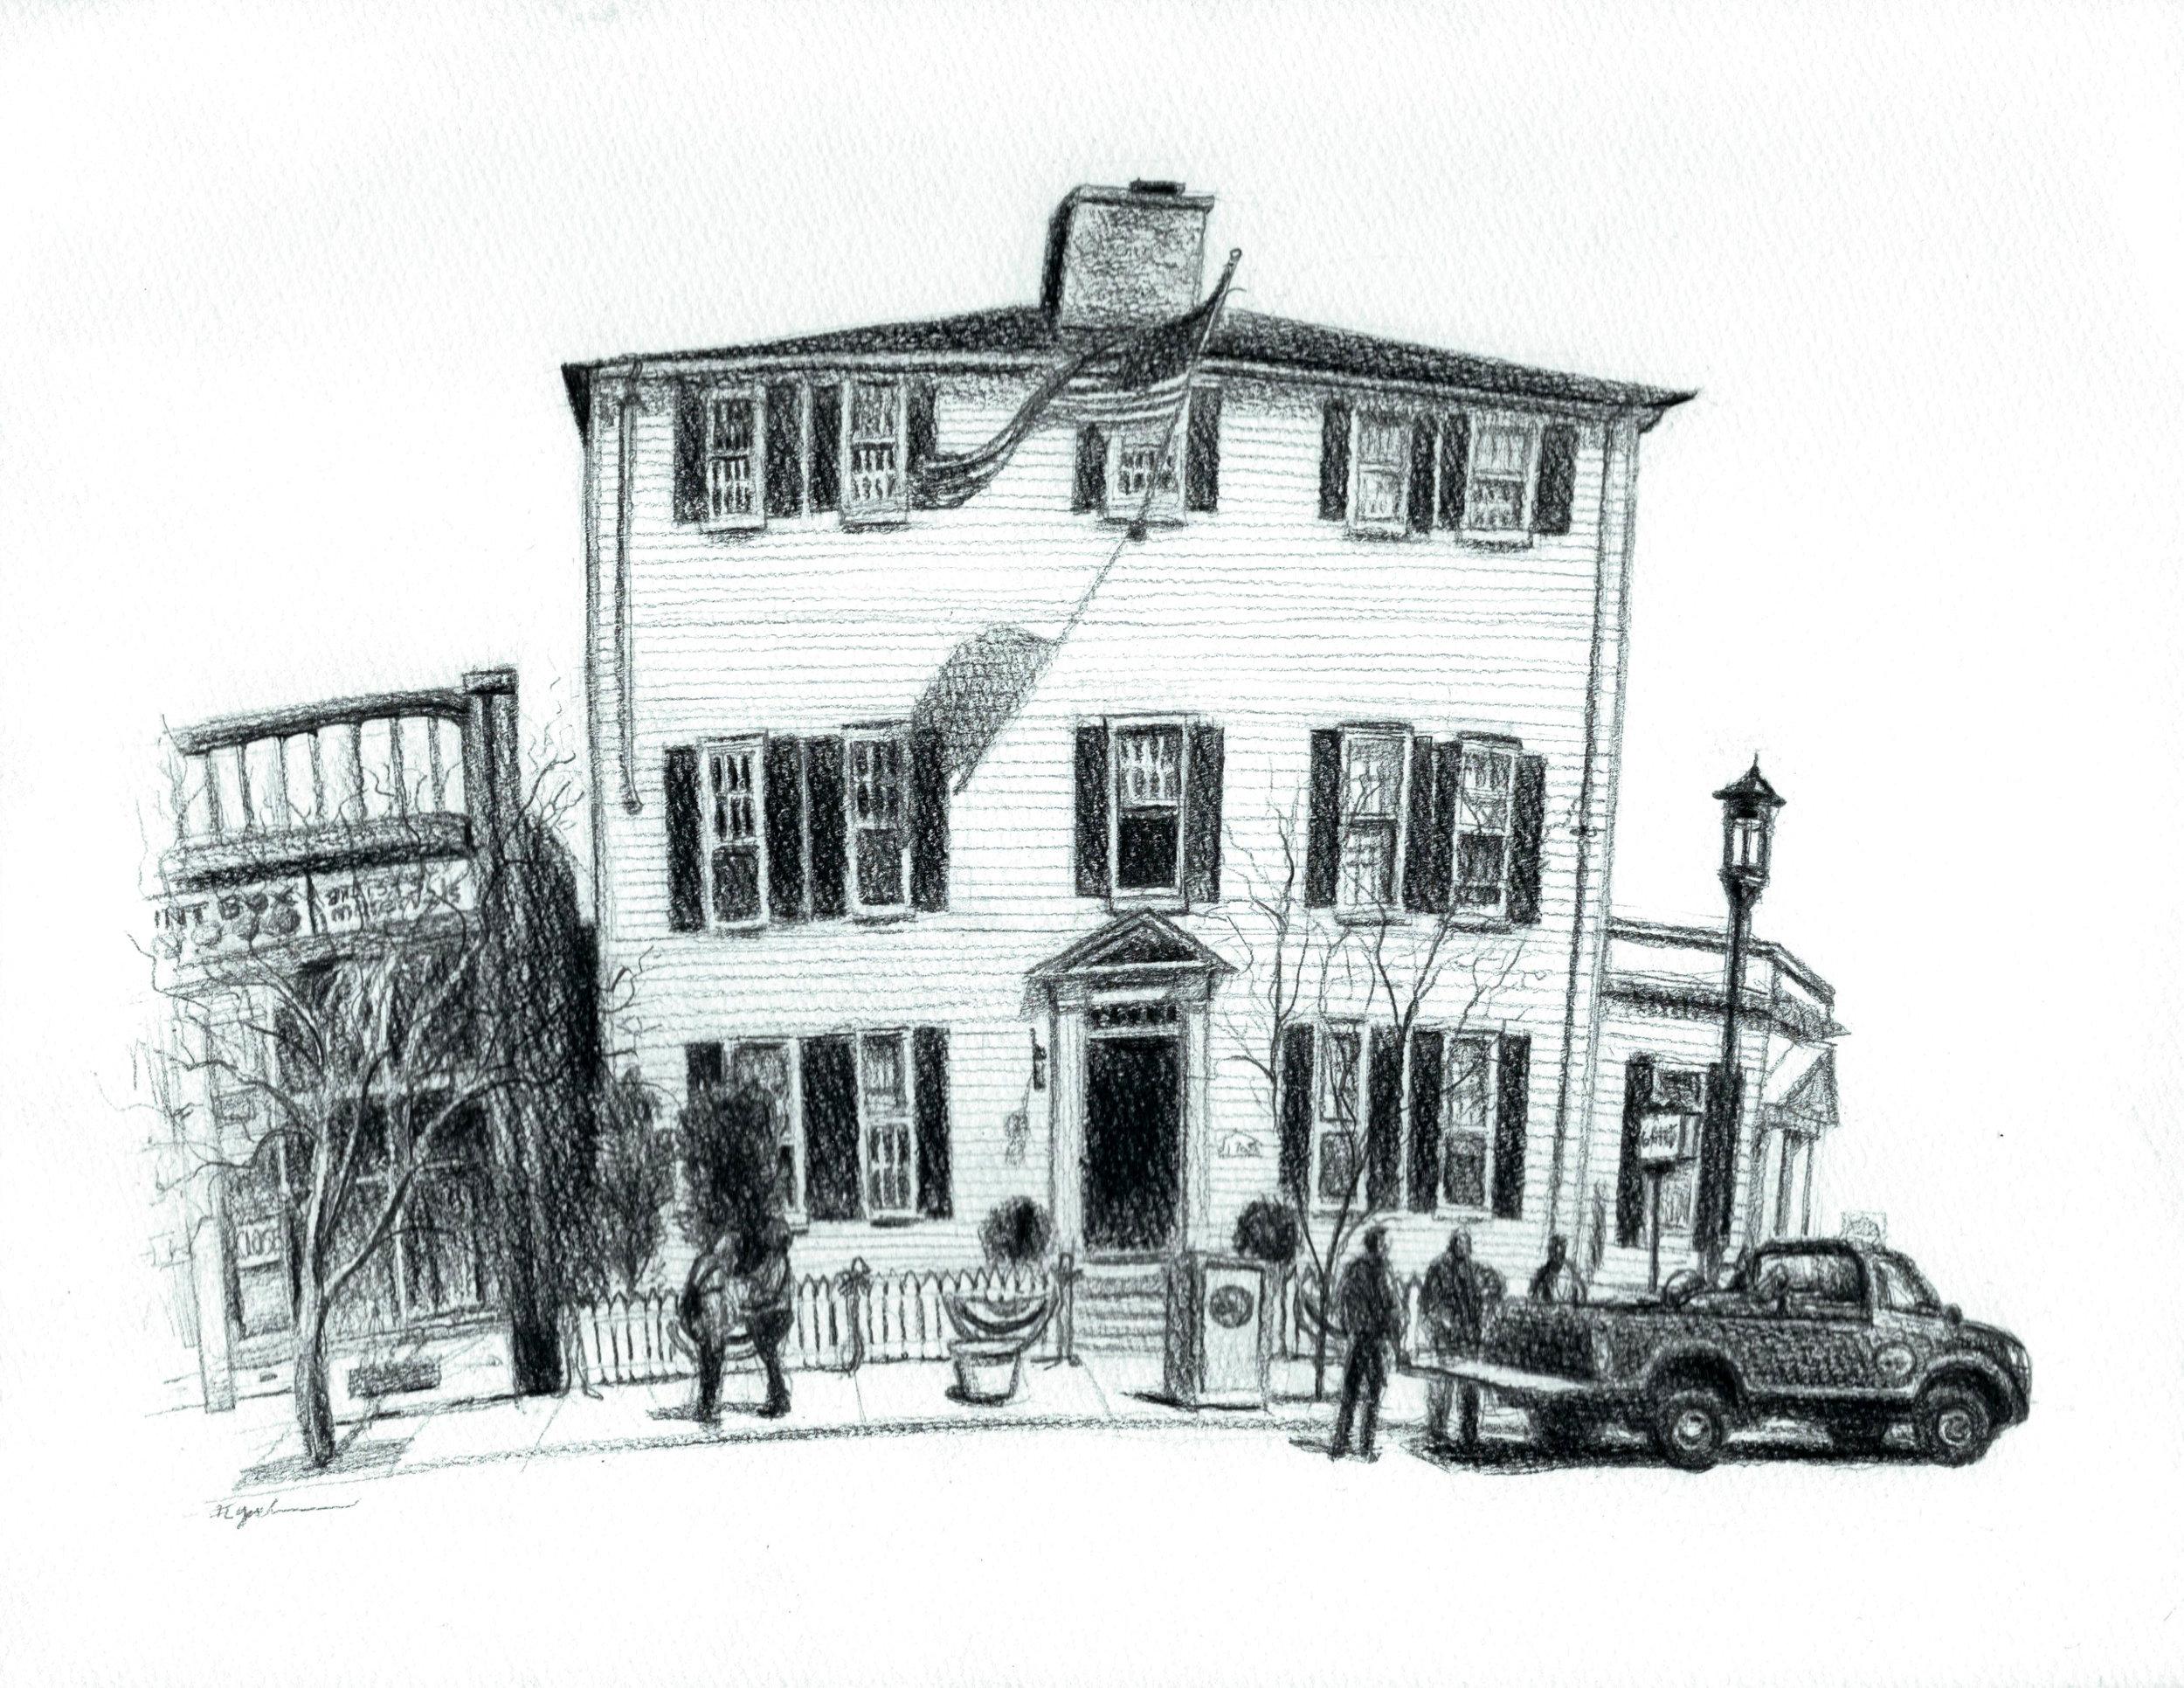 Gaffey's Funeral Home